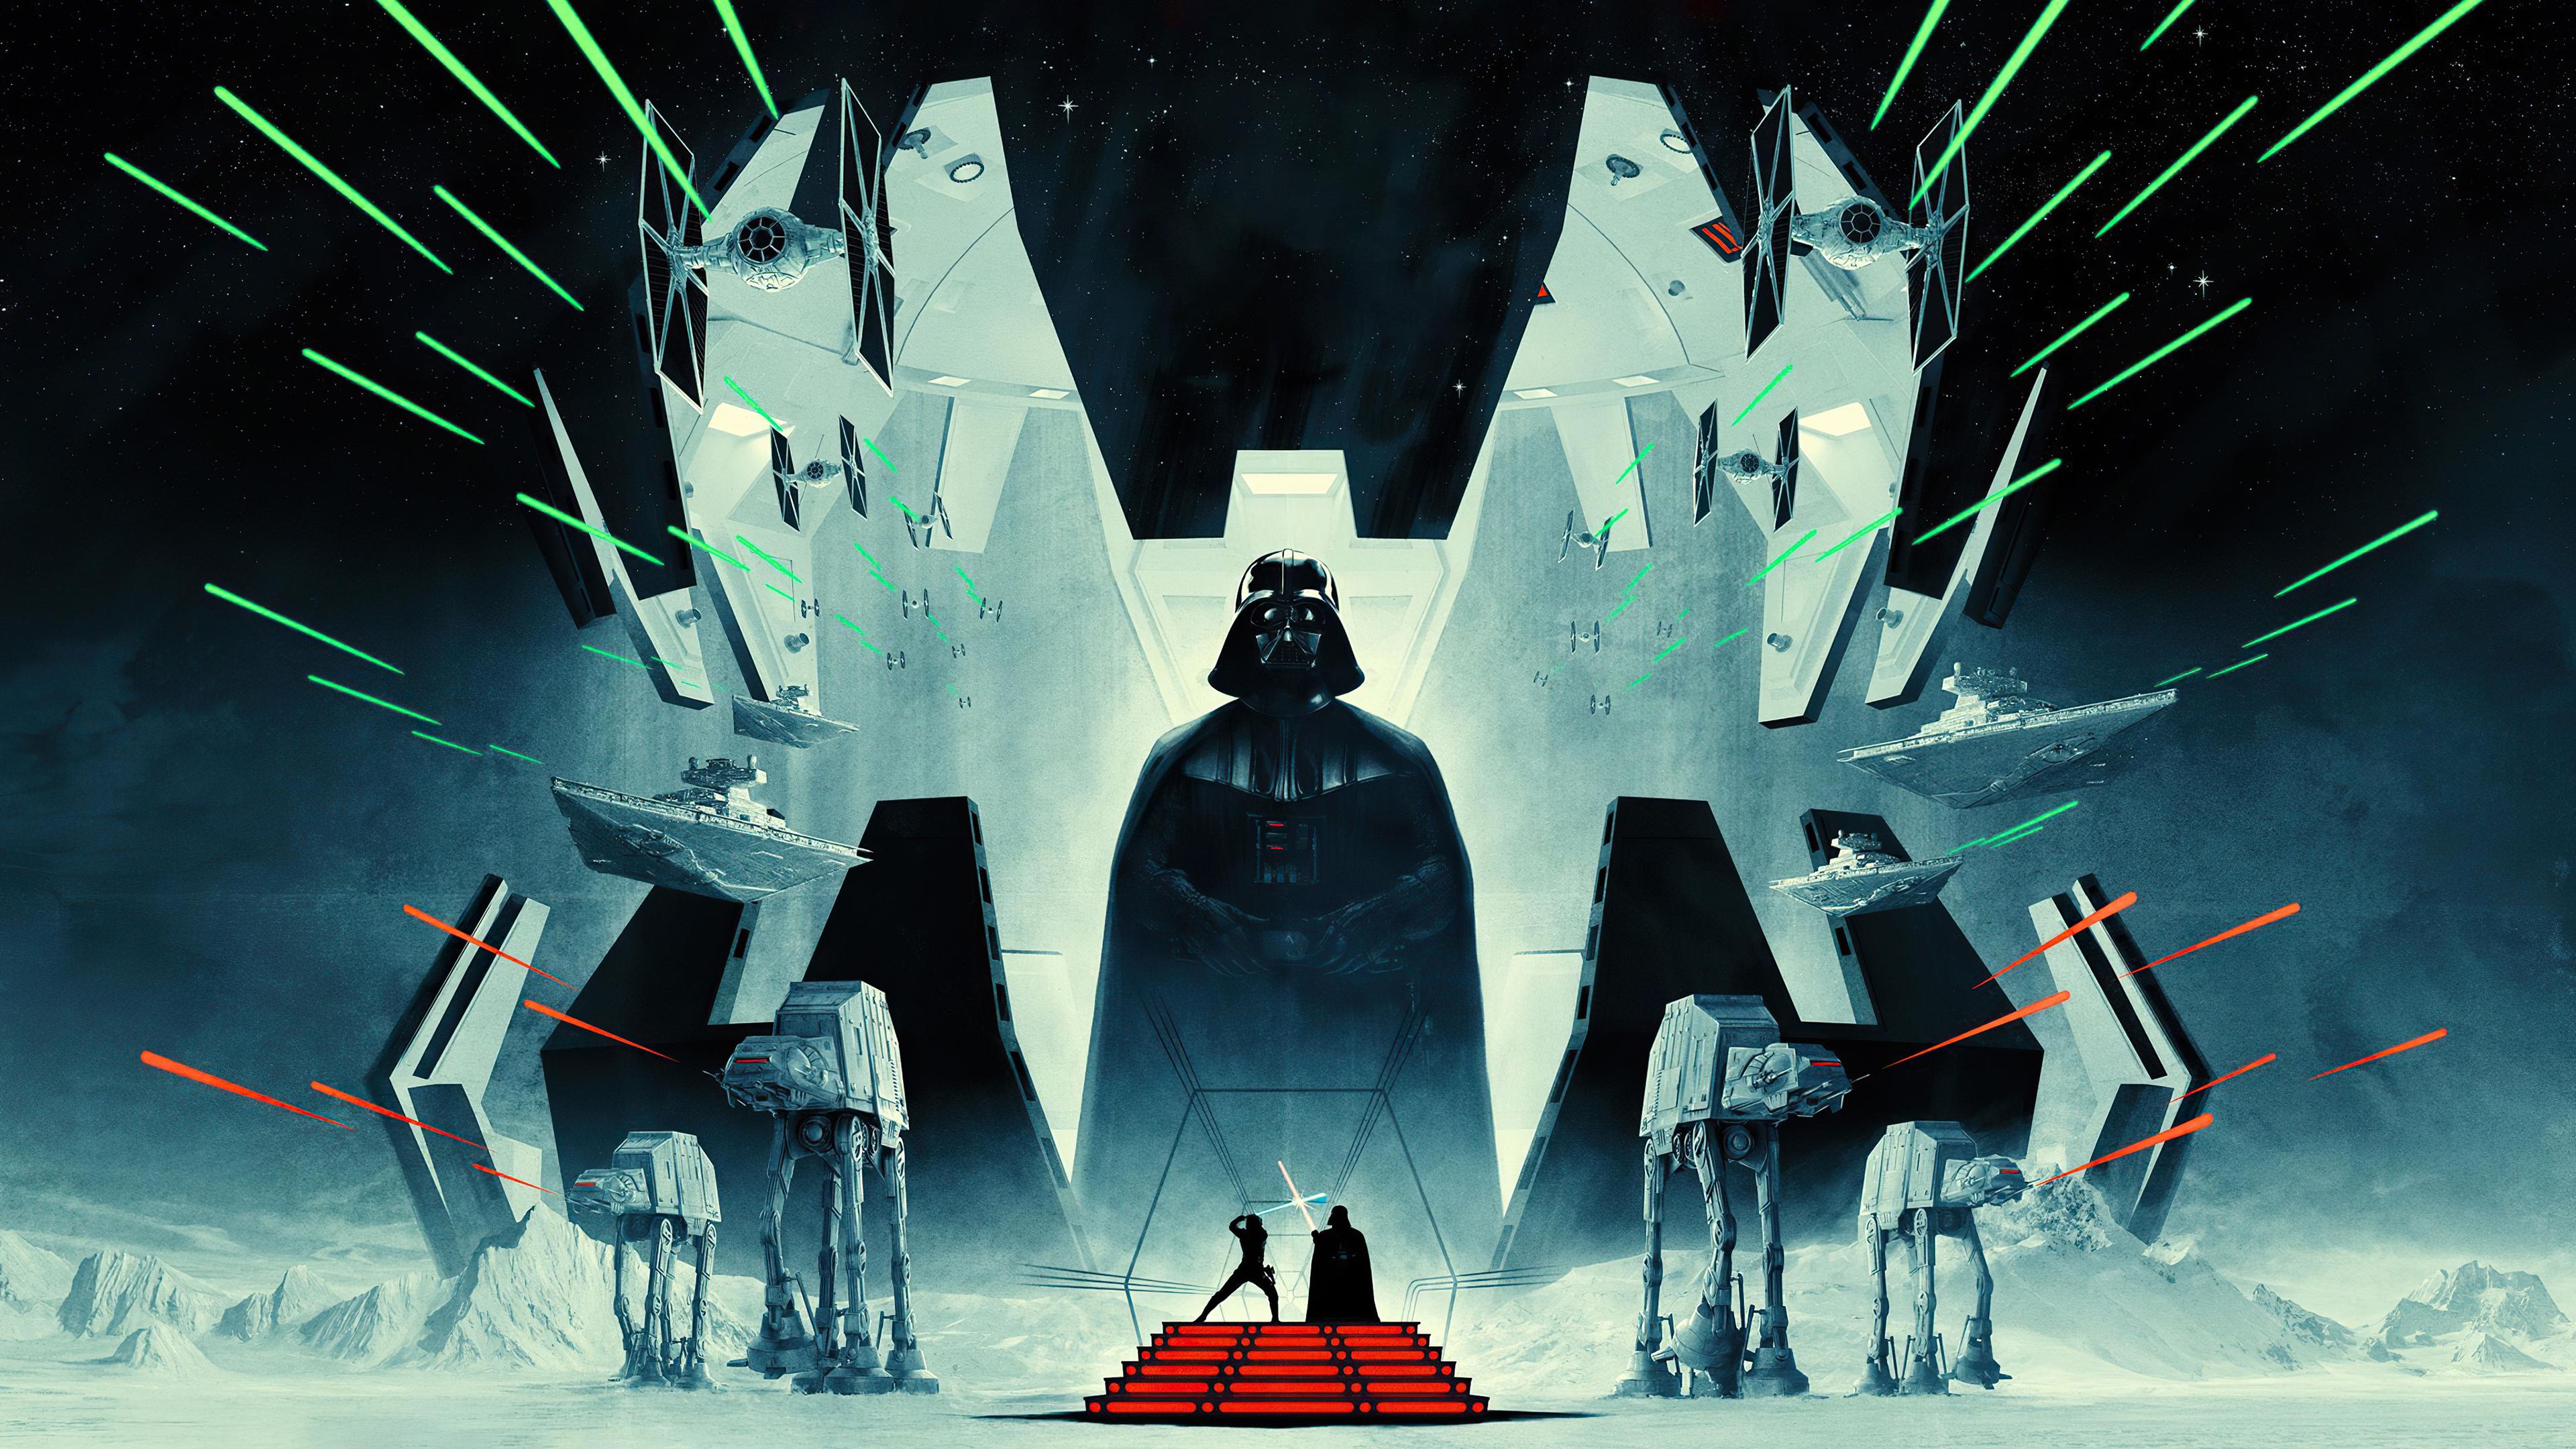 star wars empire strikes back 4k 1615192143 - Star Wars Empire Strikes Back 4k - Star Wars Empire Strikes Back 4k wallpapers